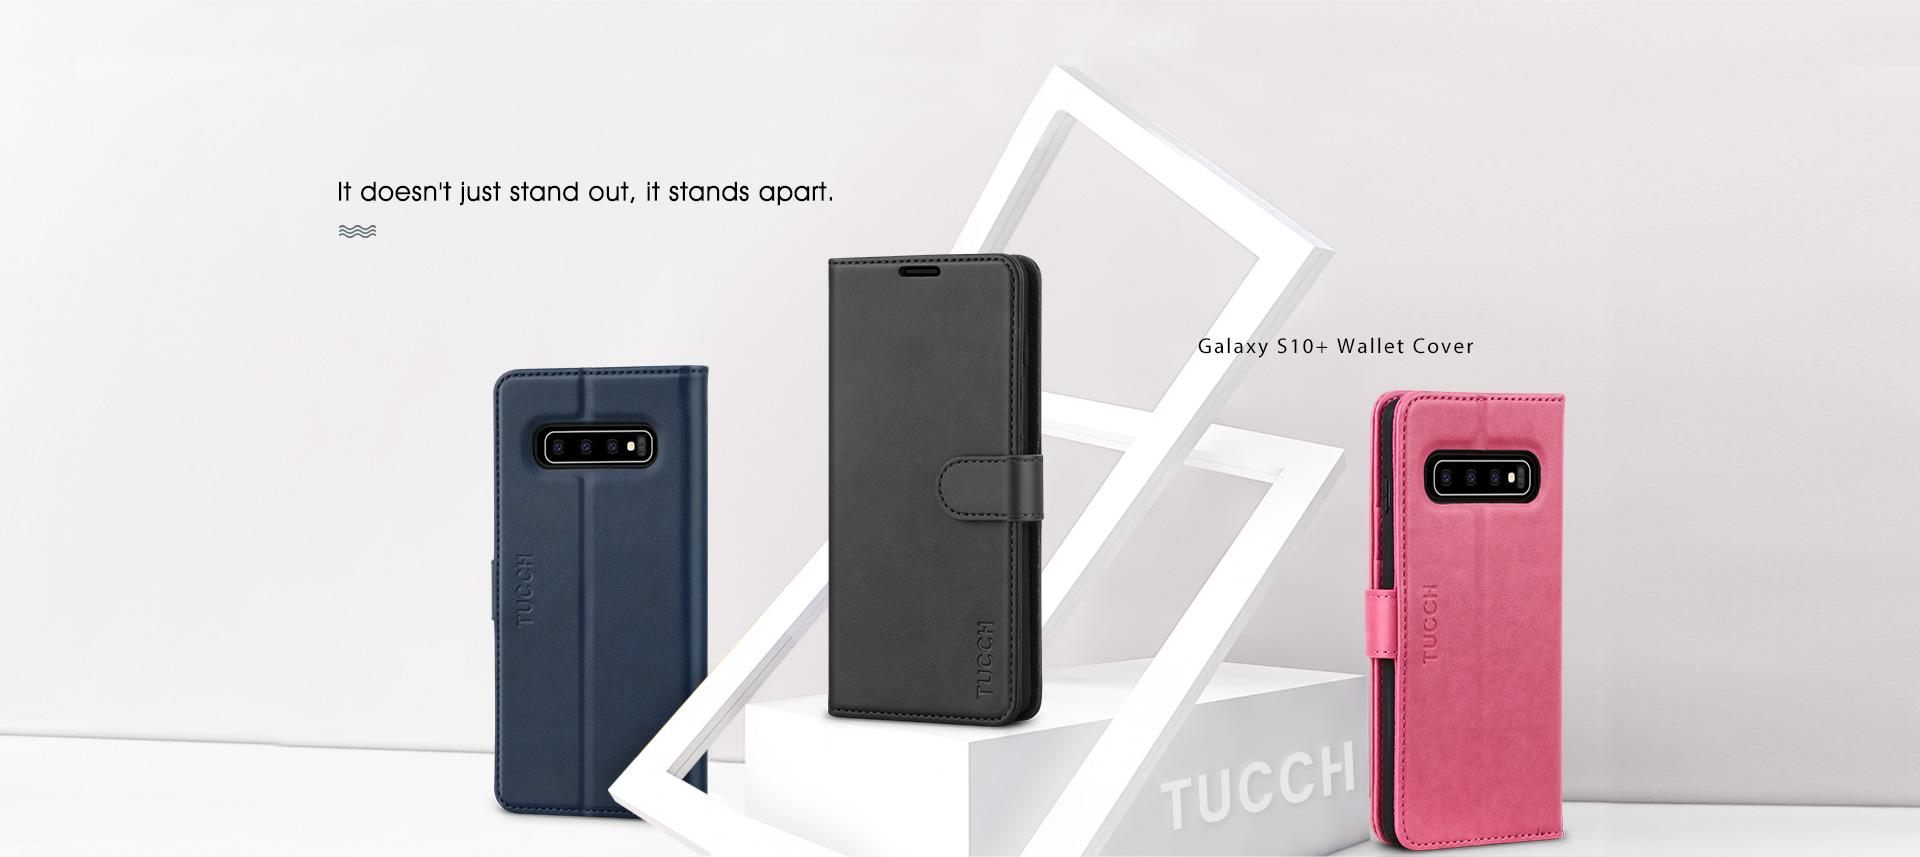 Samsung Galaxy S10 Plus Covers